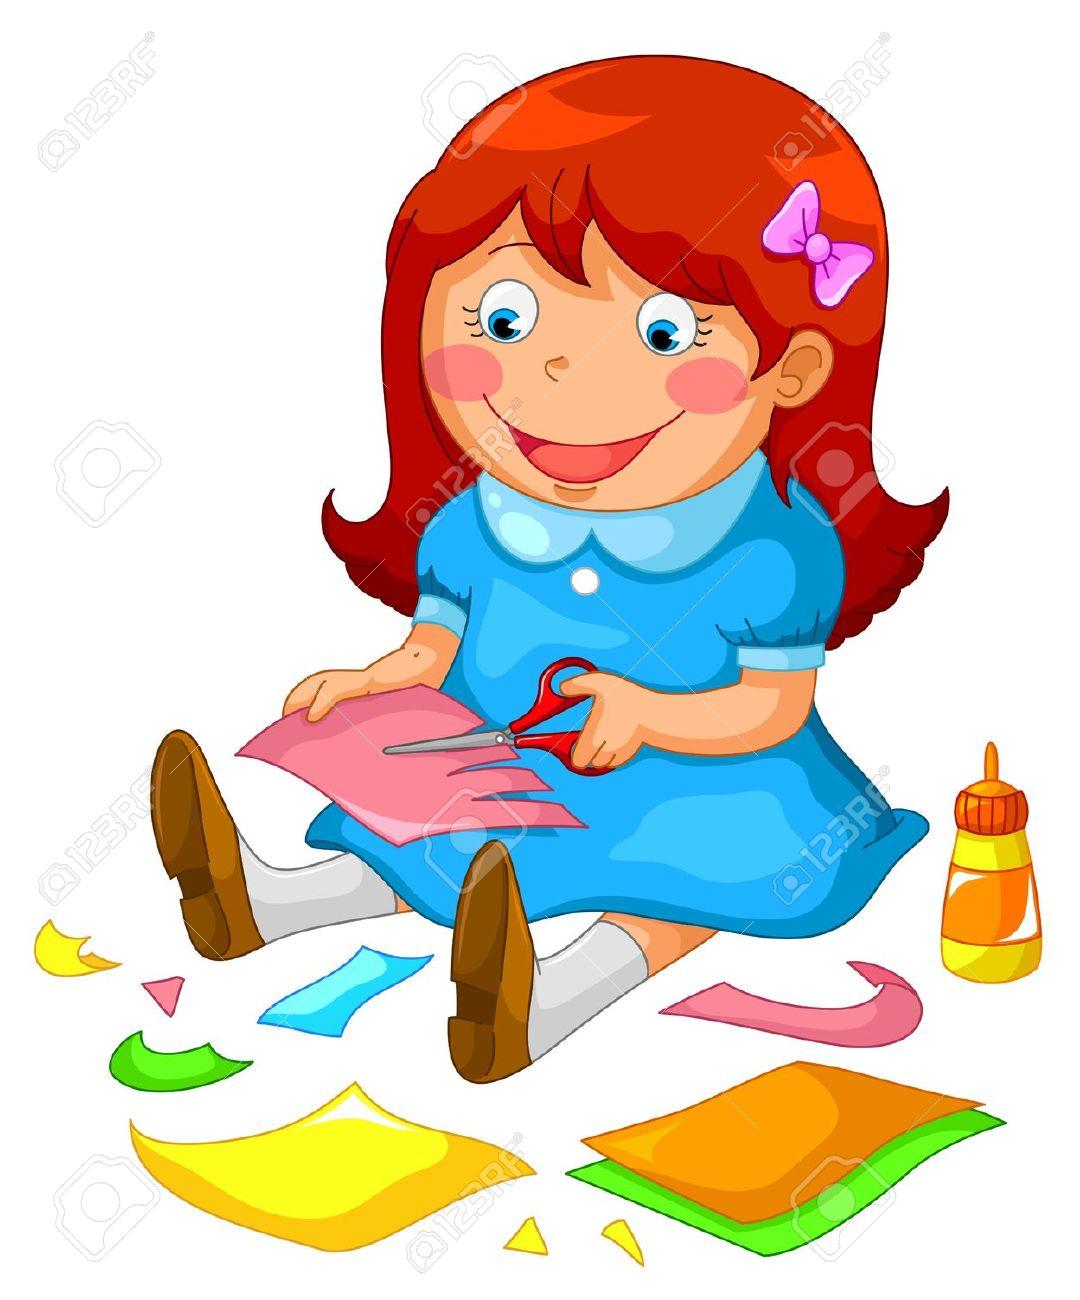 Girl cutting paper clipart.